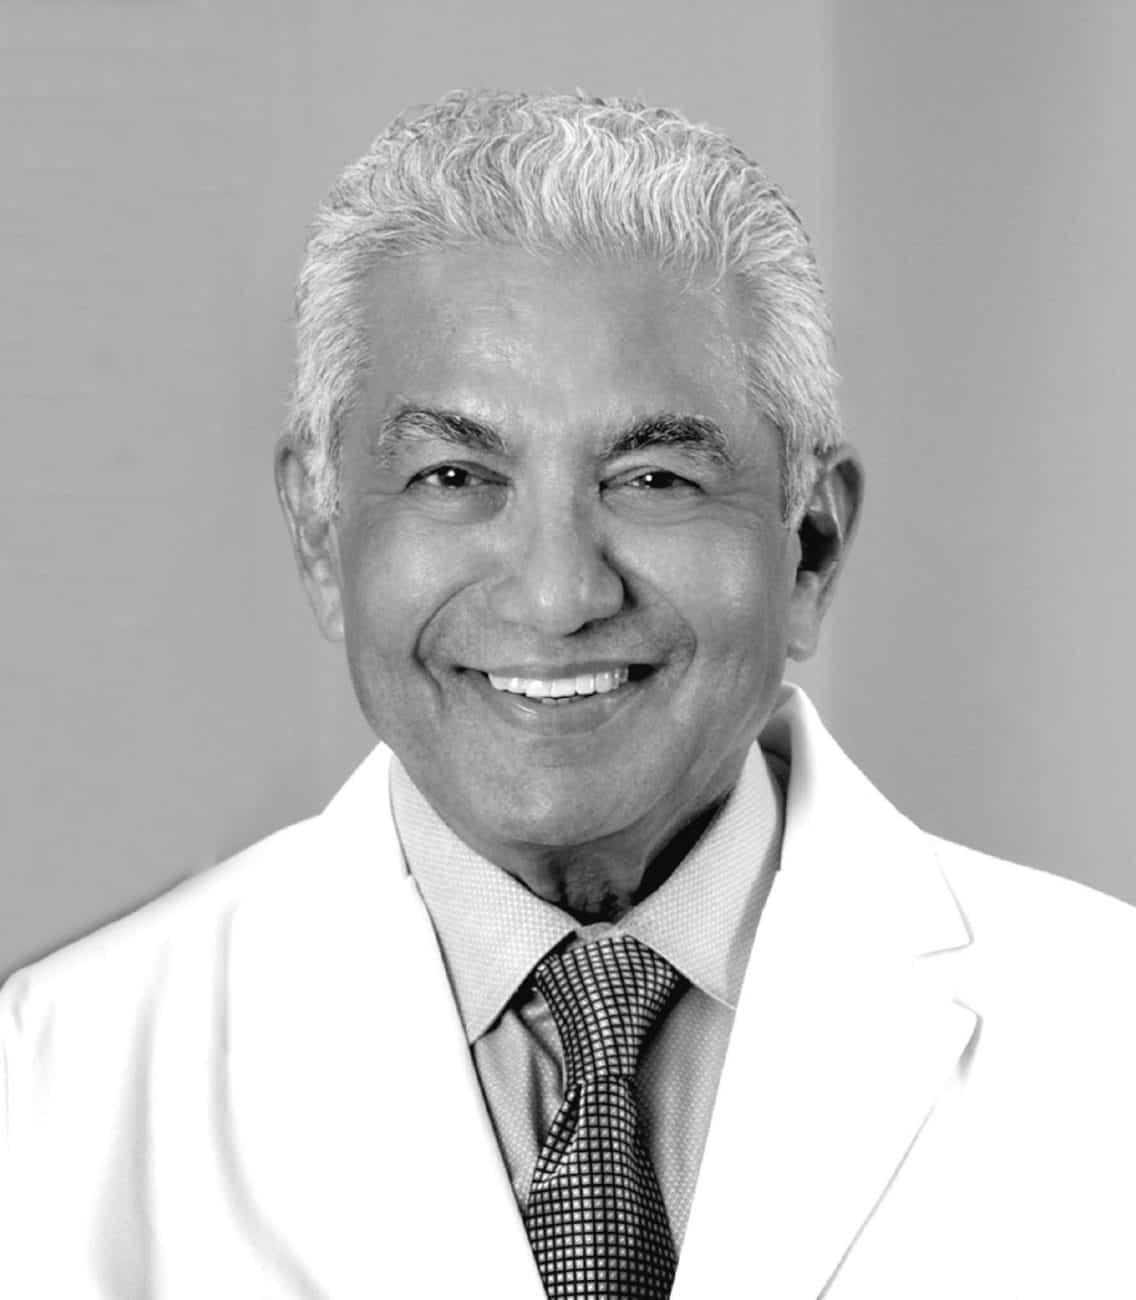 Dr. Mune Gowda MD, FACS